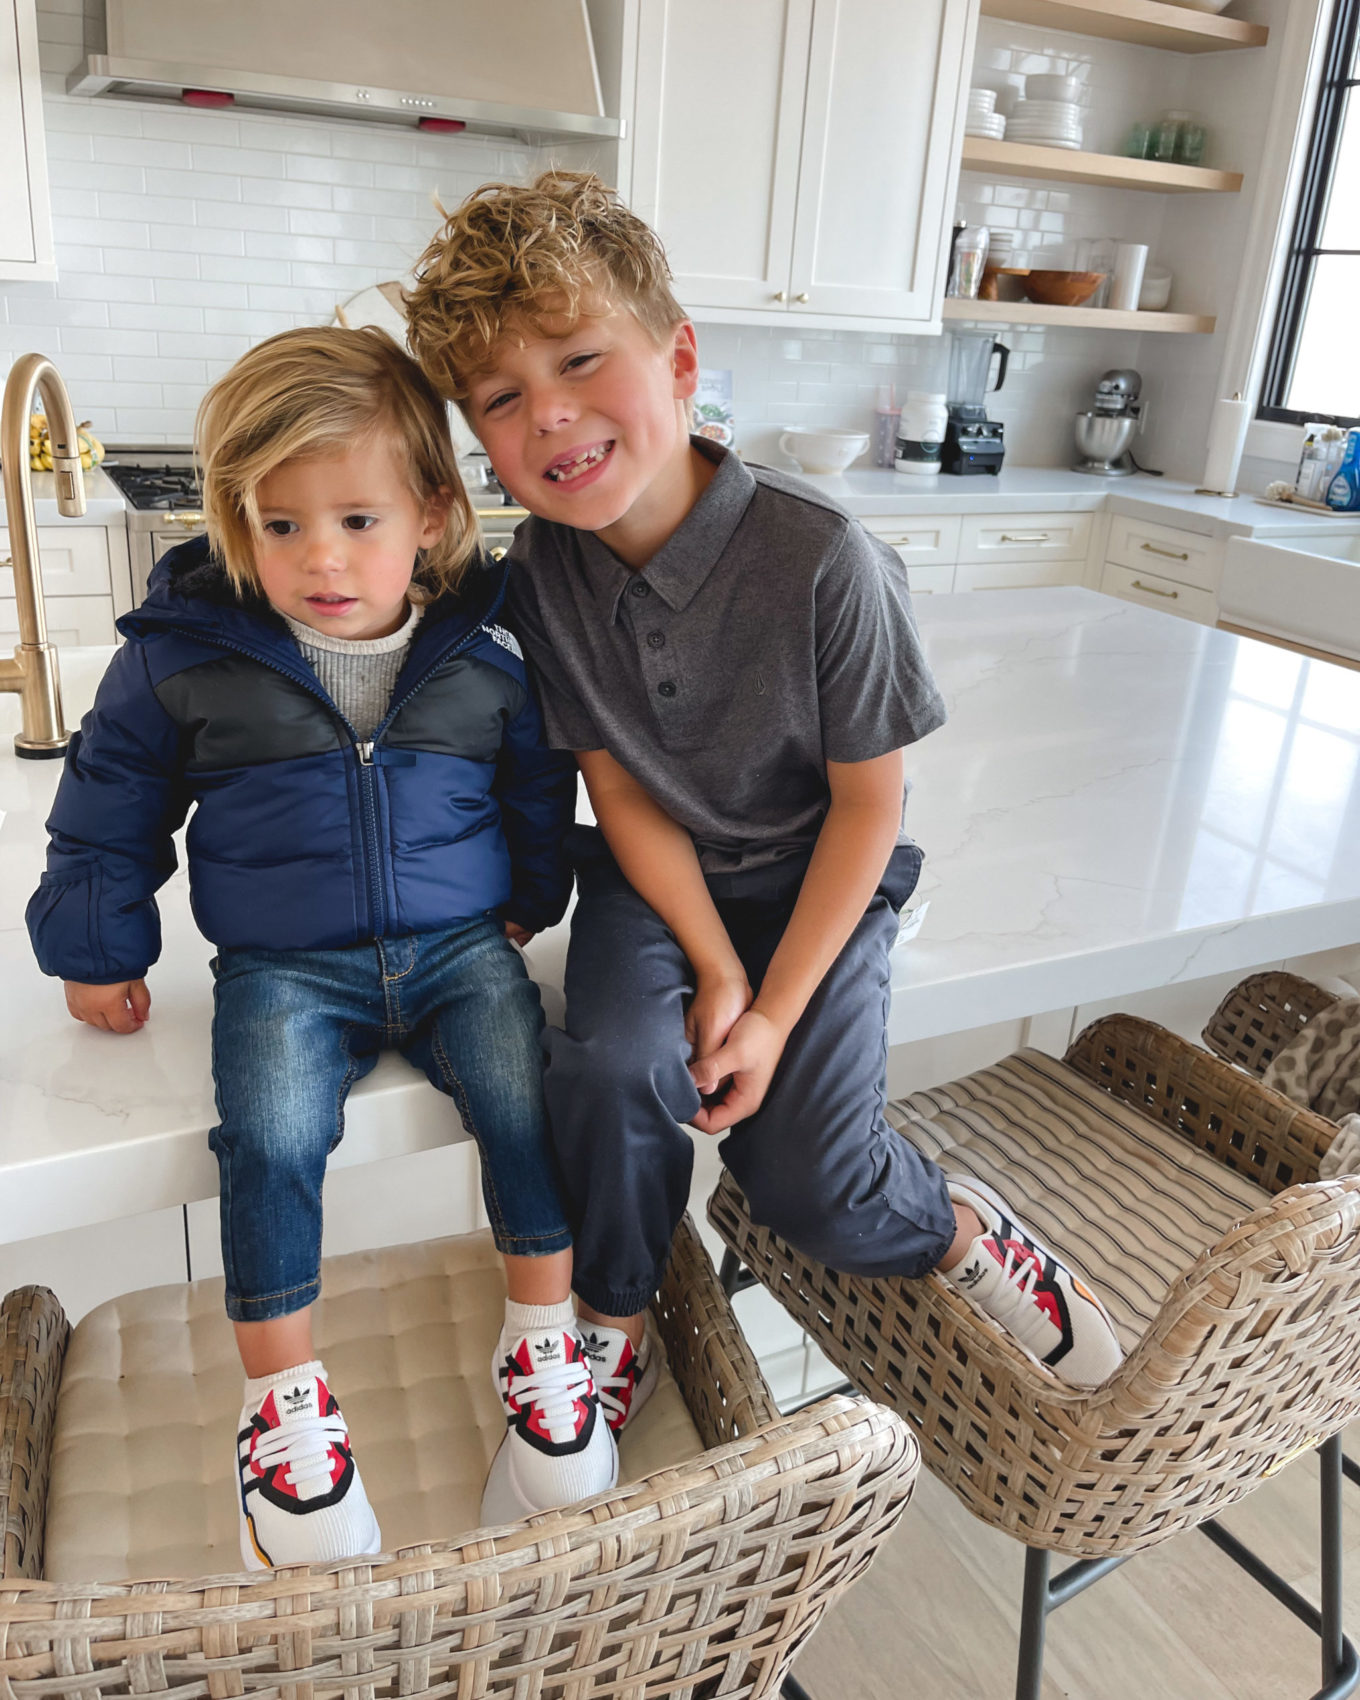 Nordstroms, Adidas sneakers, fall